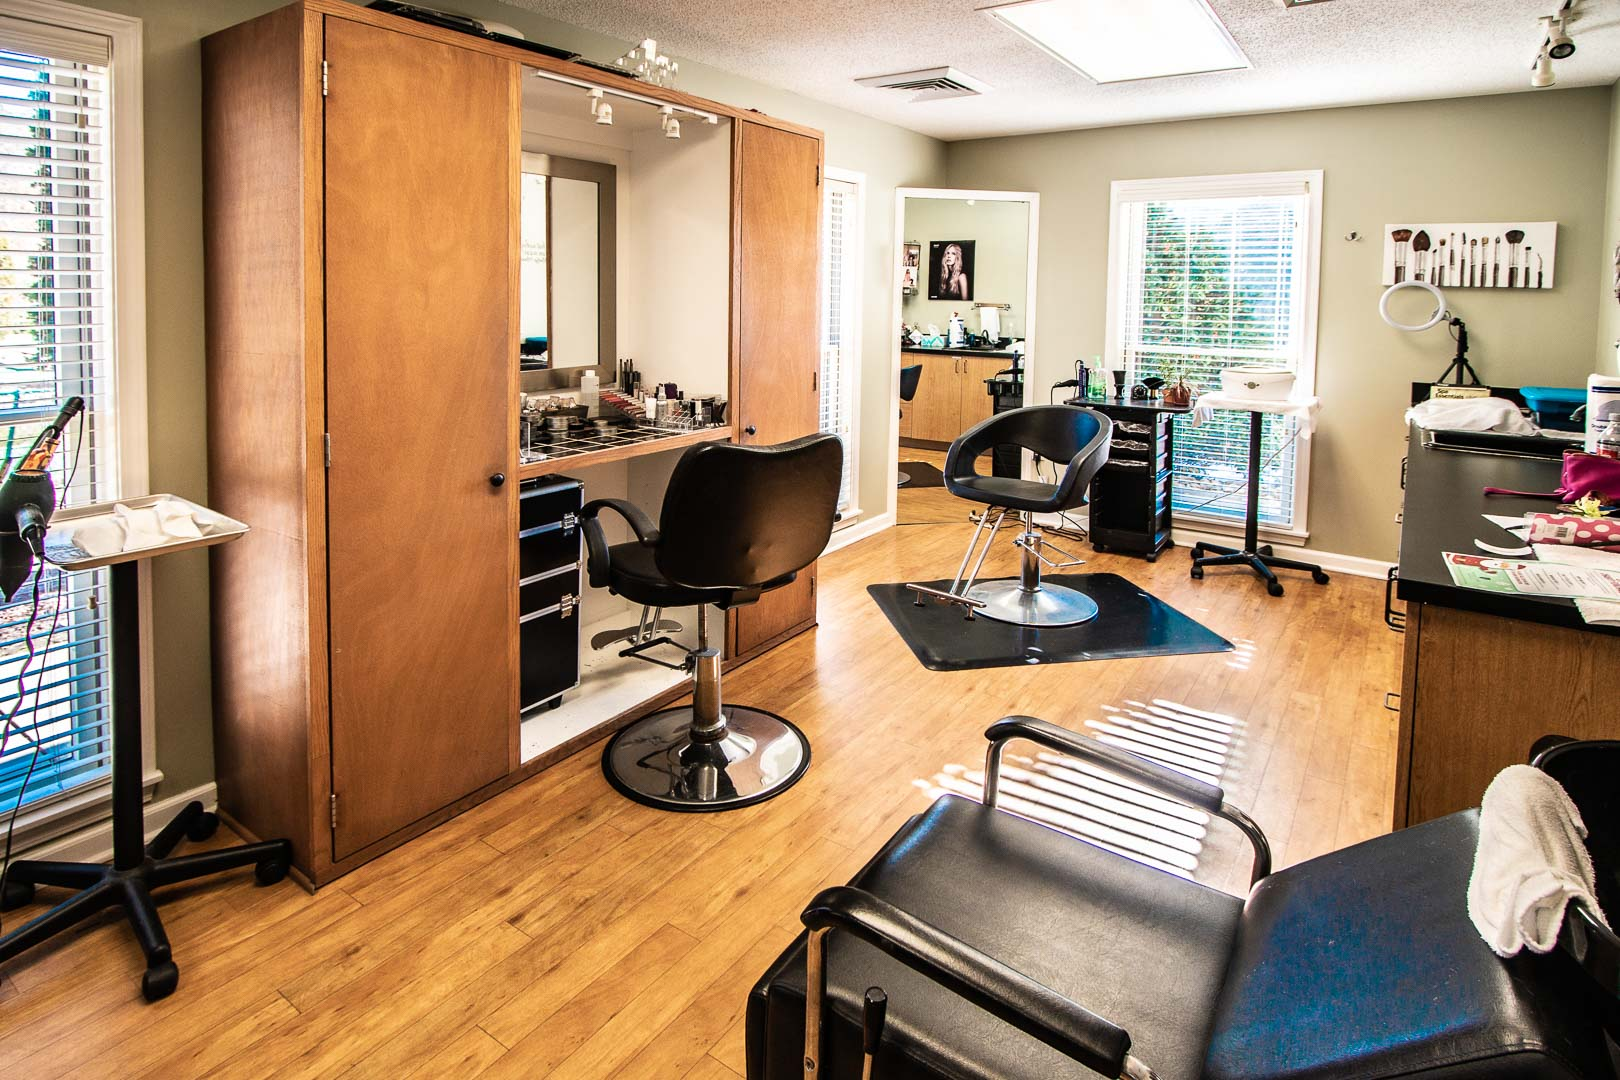 Hair salon available at VRI's Fox Run Resort in North Carolina.